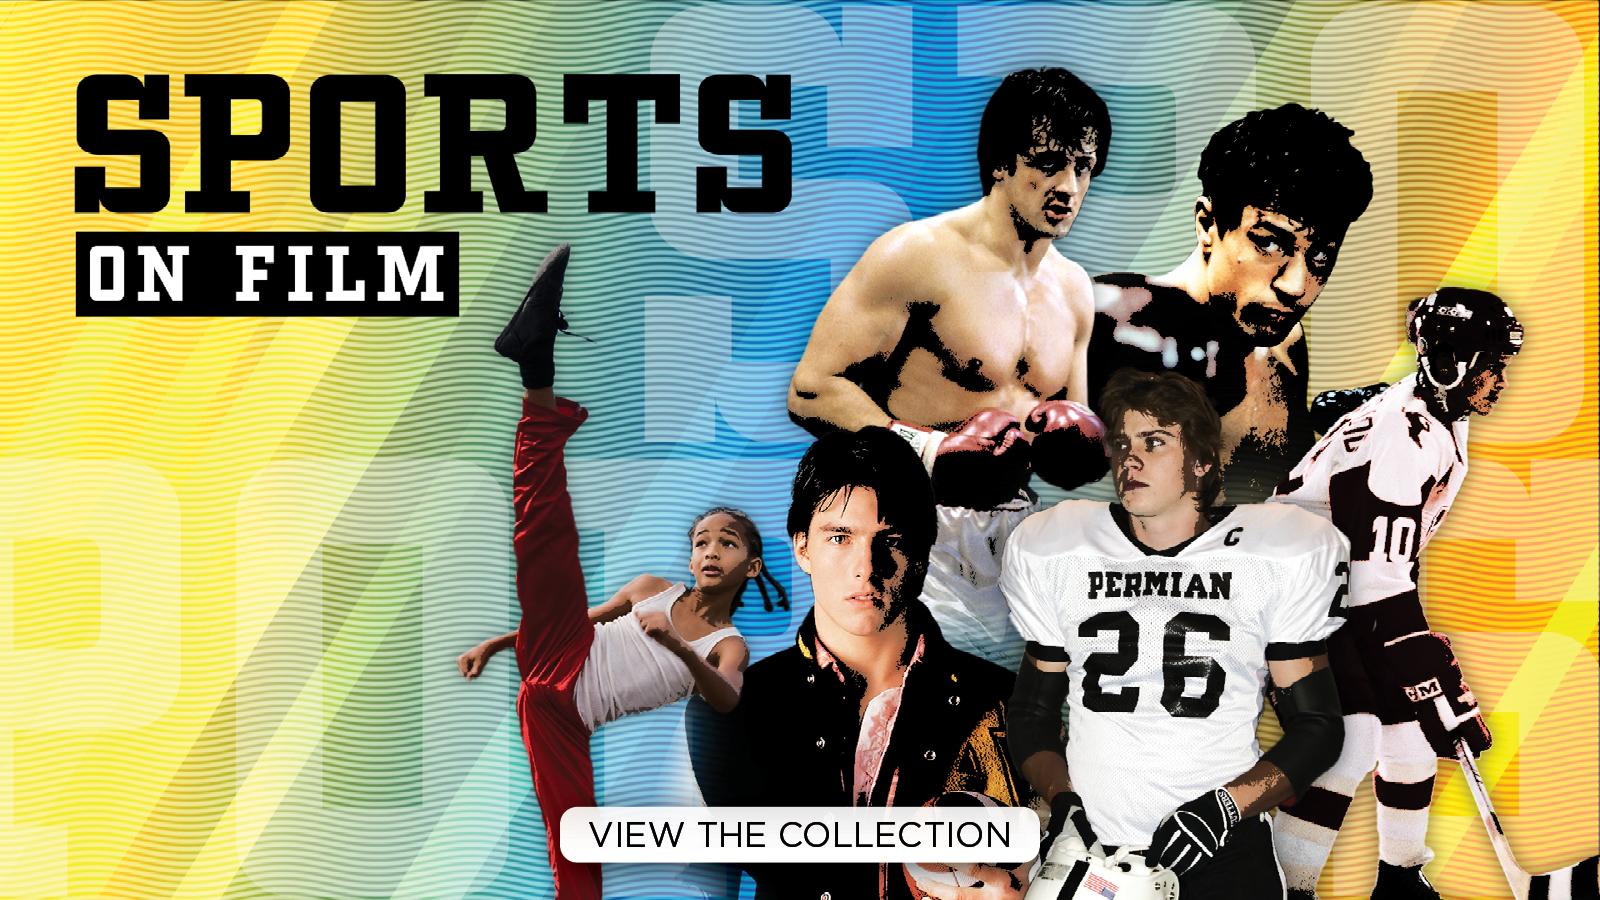 Sports on Film